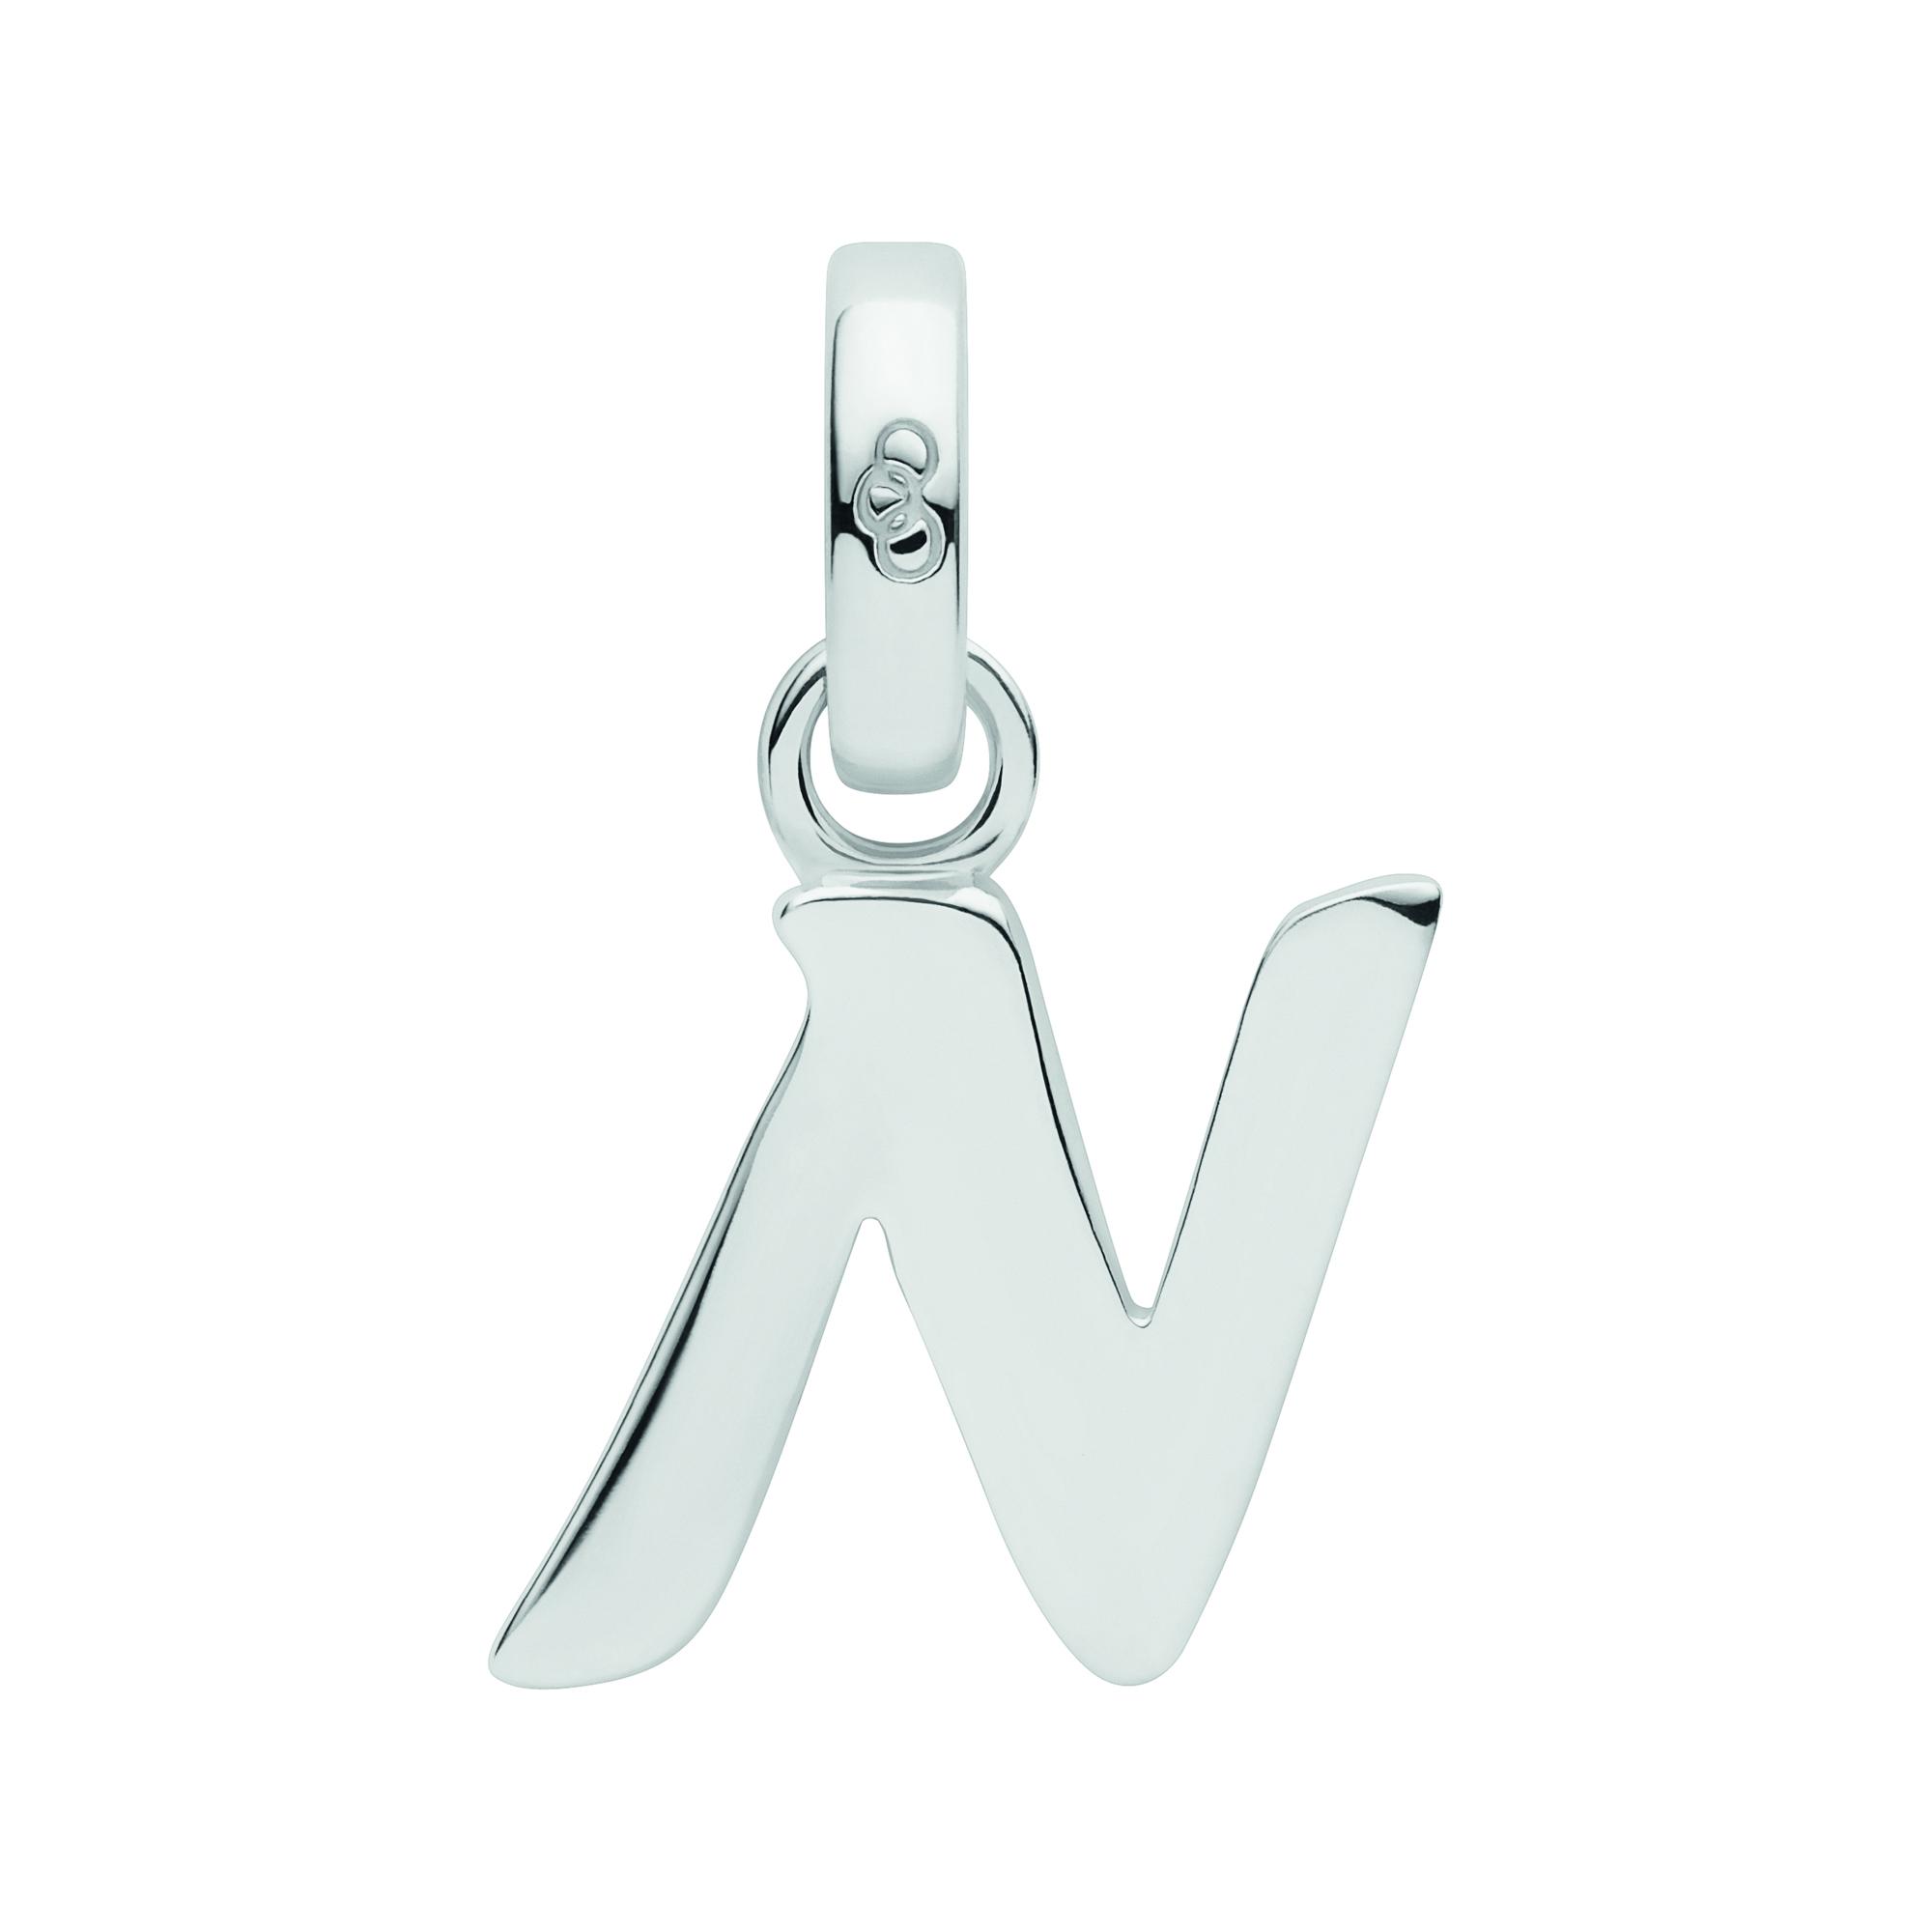 LINKS OF LONDON - Ασημένιο γούρι Alphabet Charms N γυναικεία αξεσουάρ κοσμήματα παντατίφ